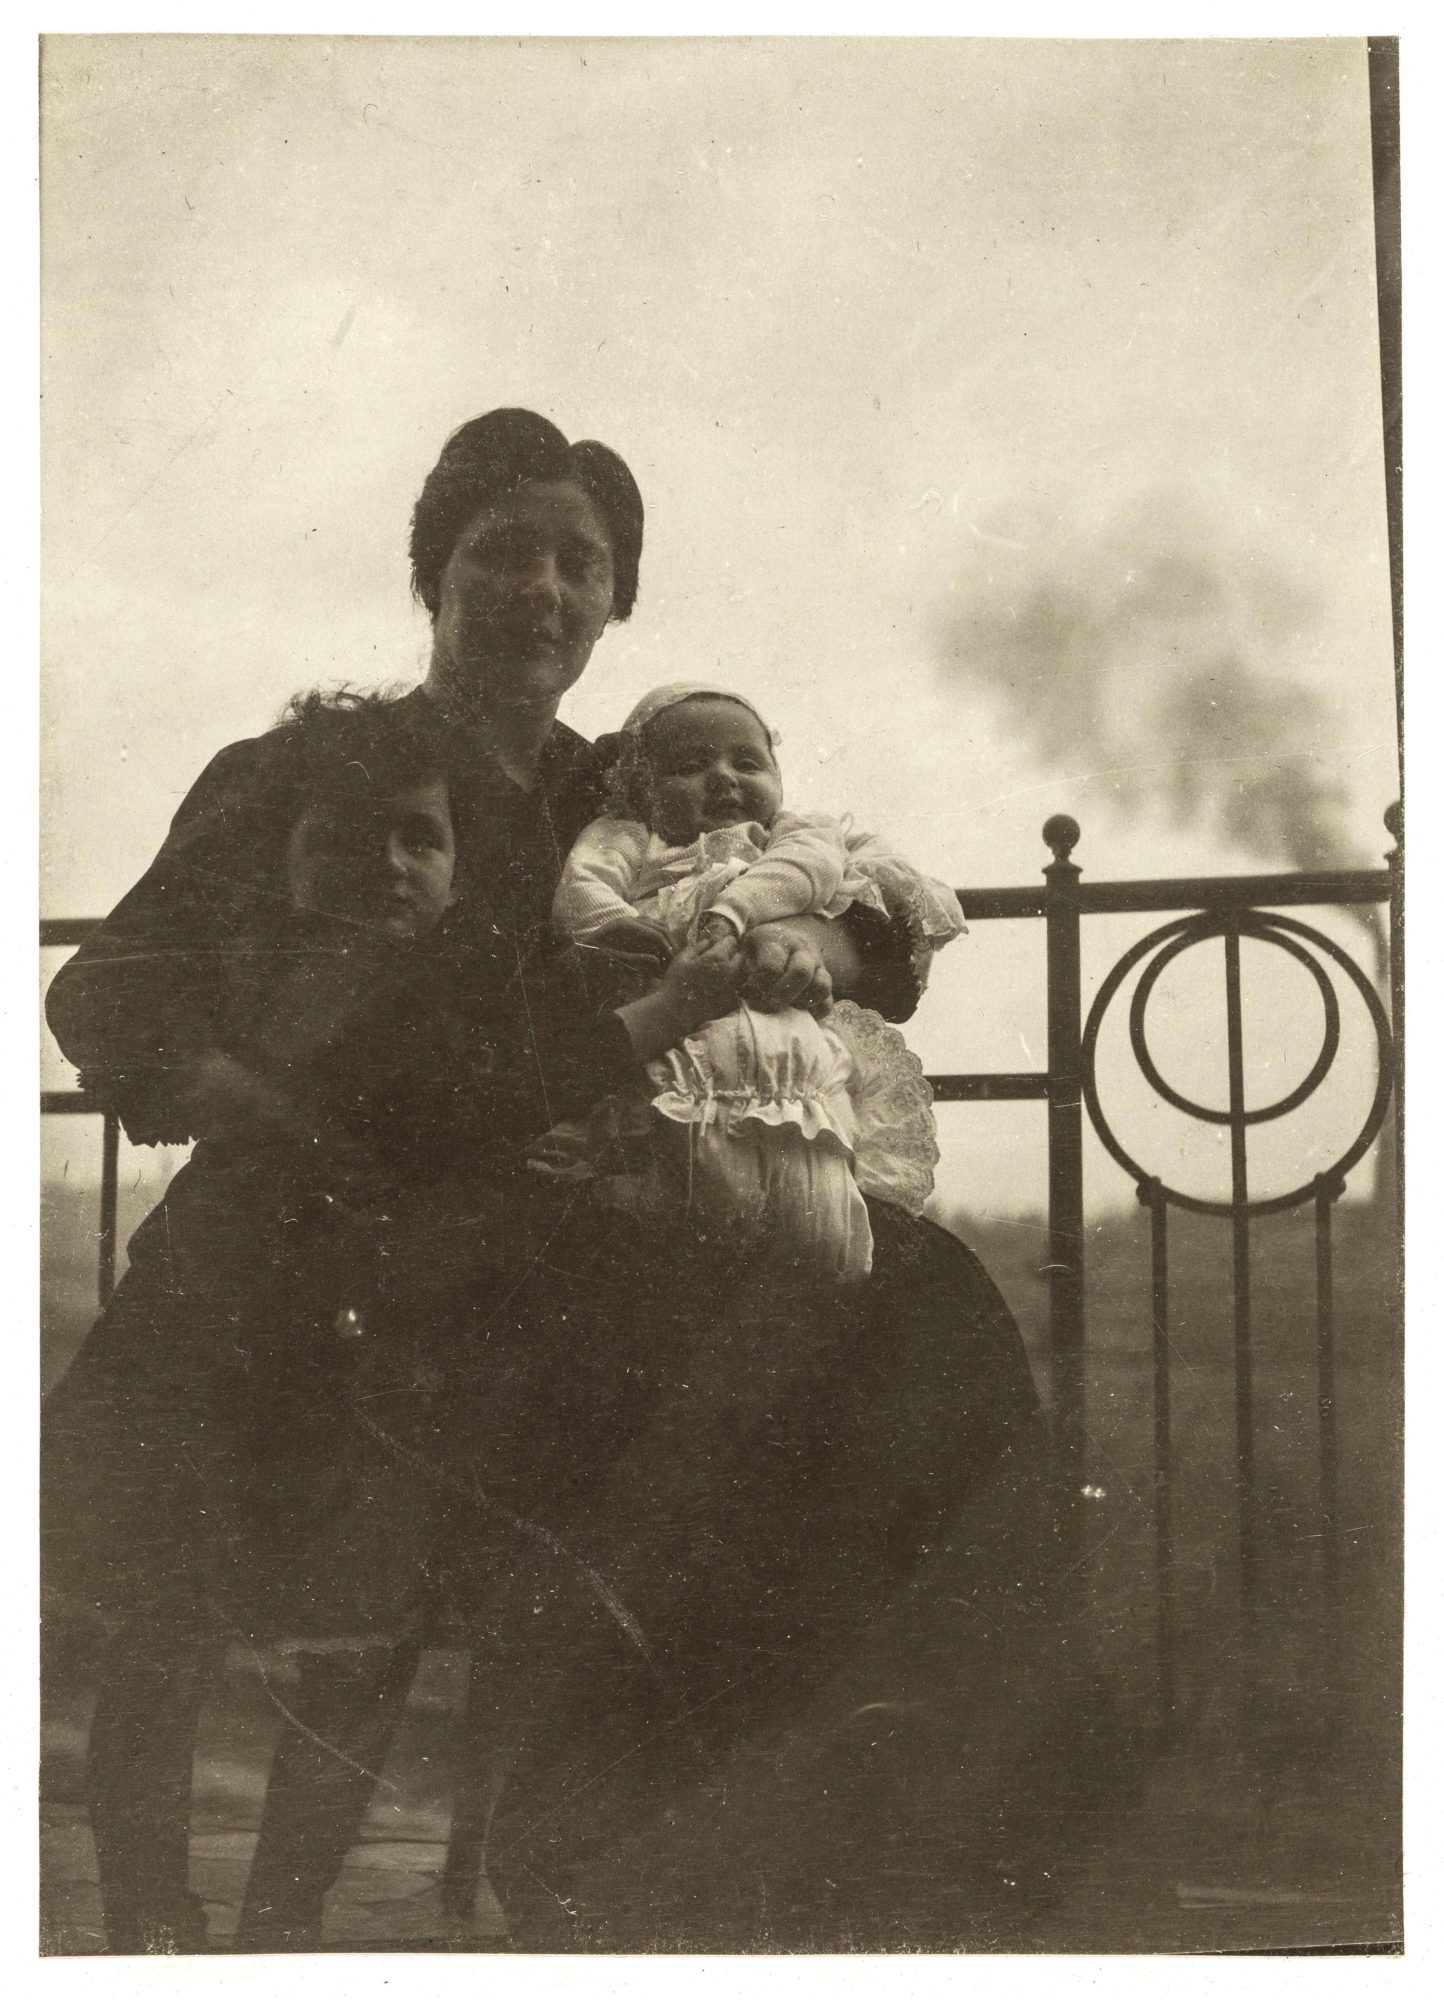 Melanie Klein avec ses enfants Melitta et Hans en 1907 ou 1908